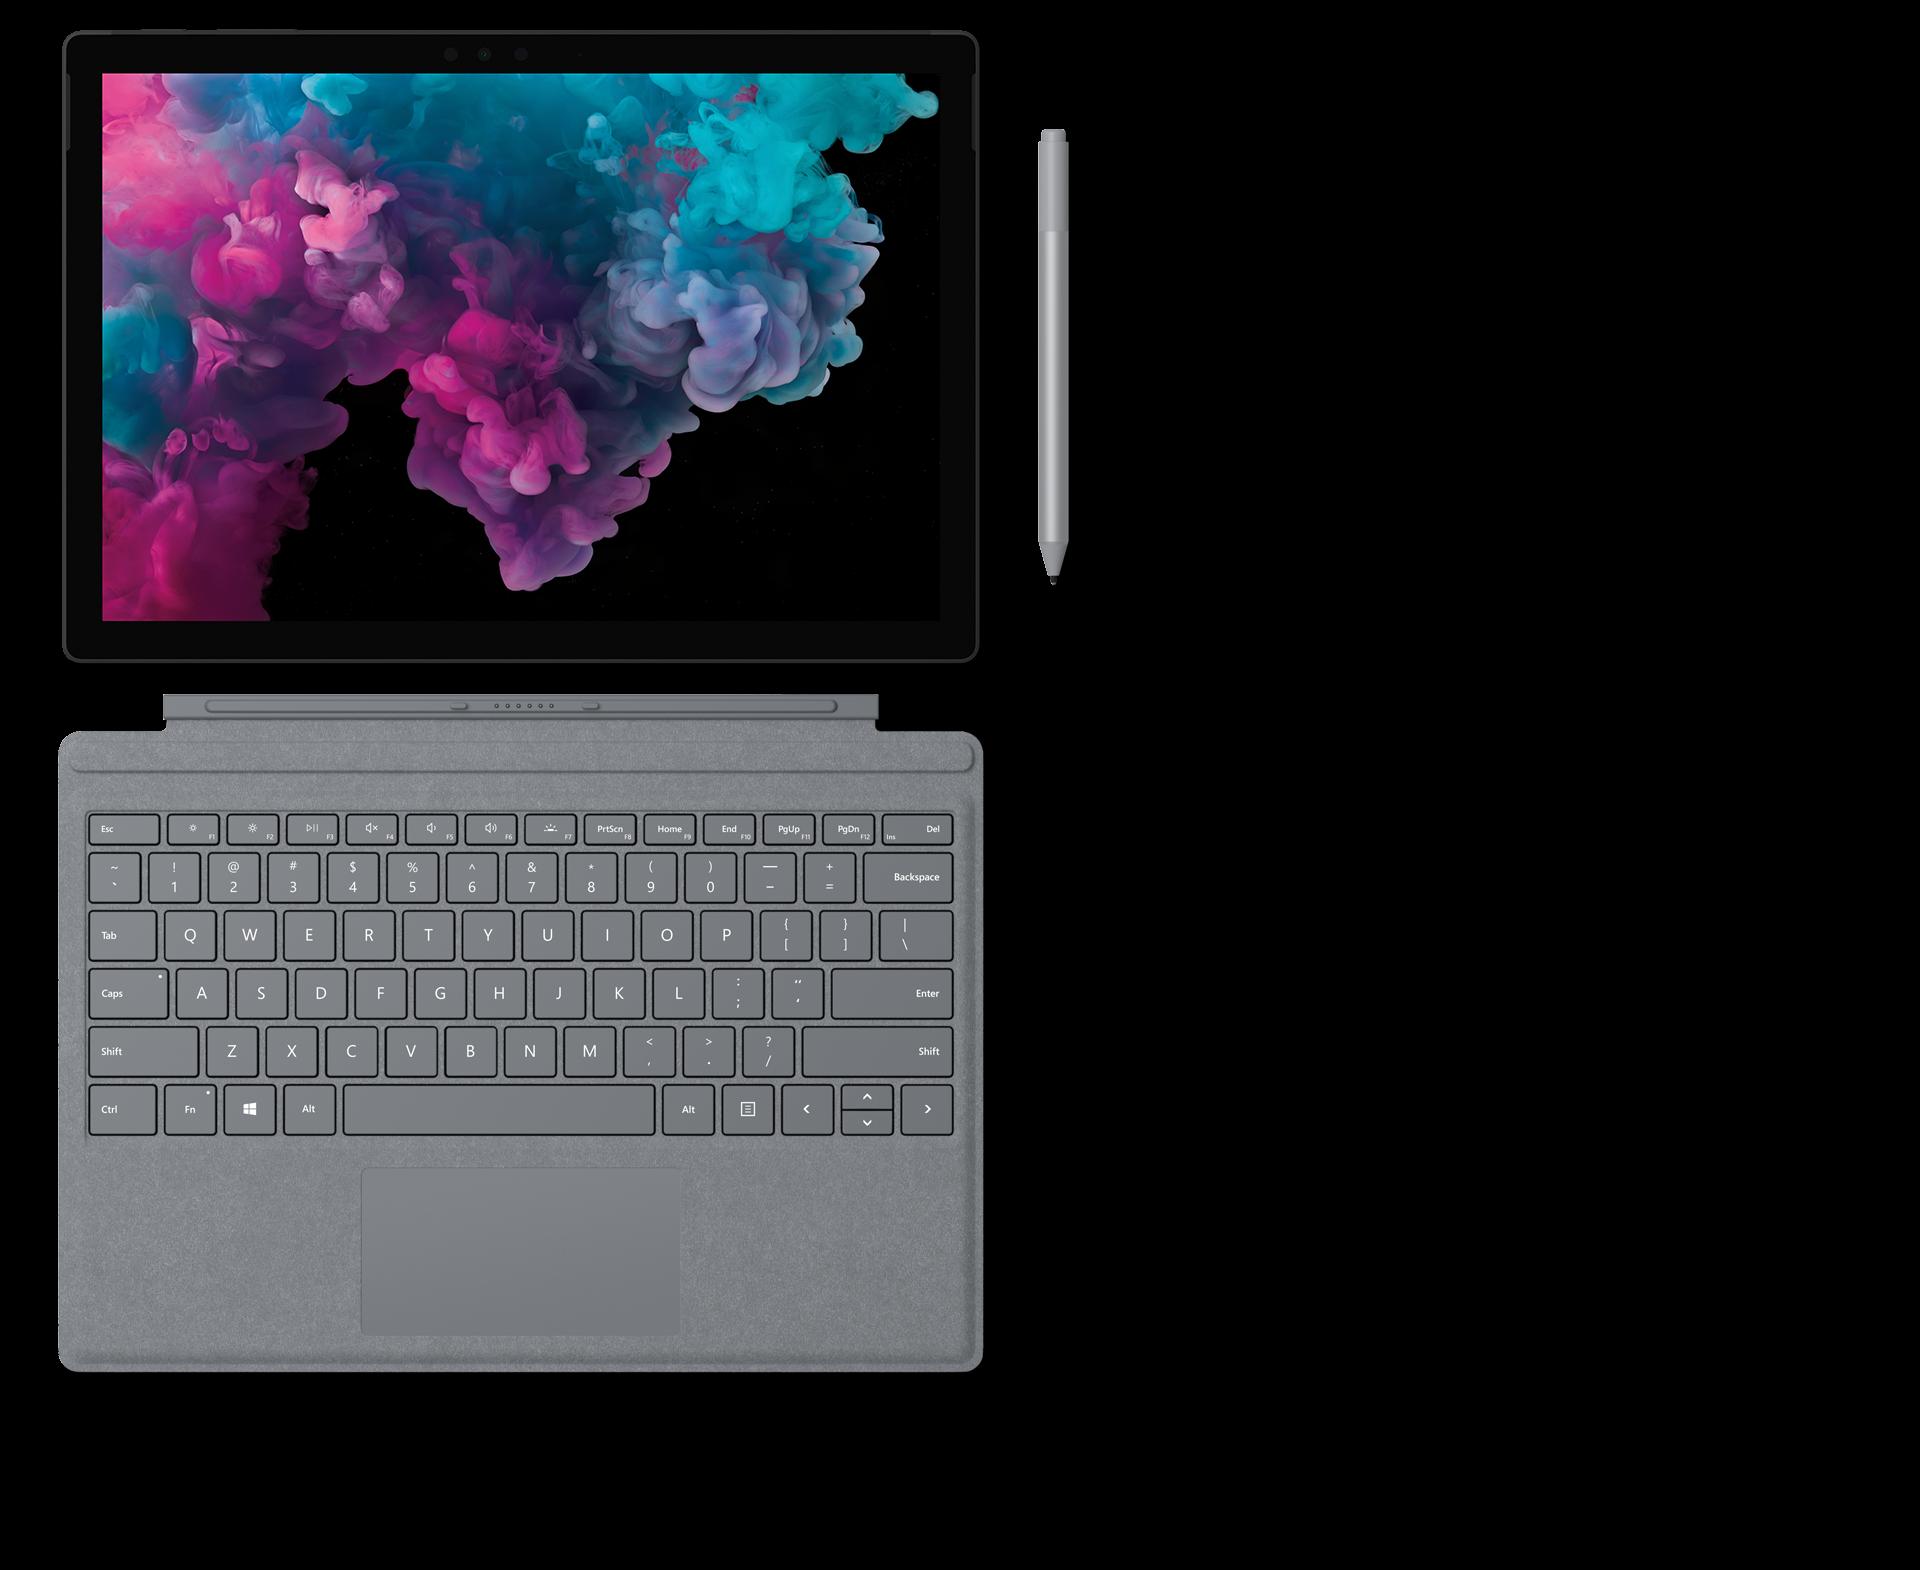 配備 Surface 專業鍵盤蓋、Surface 觸控筆和 Surface Arc 鼠標的 Surface Pro 6 。